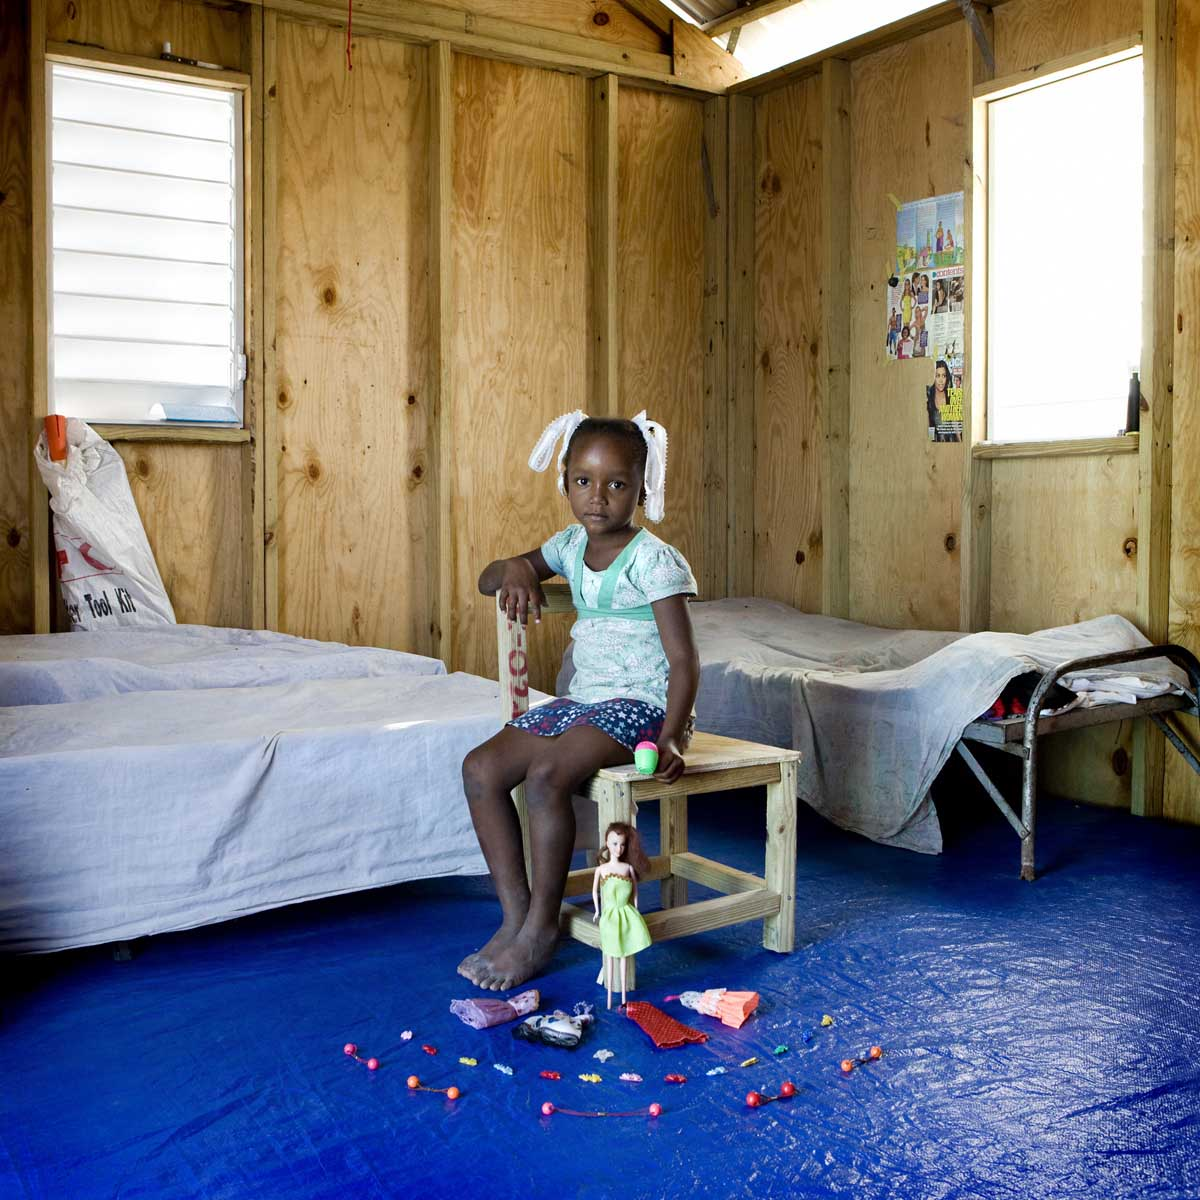 Port-au-Prince, Haiti, child, toy, precious, beautiful, belonggings